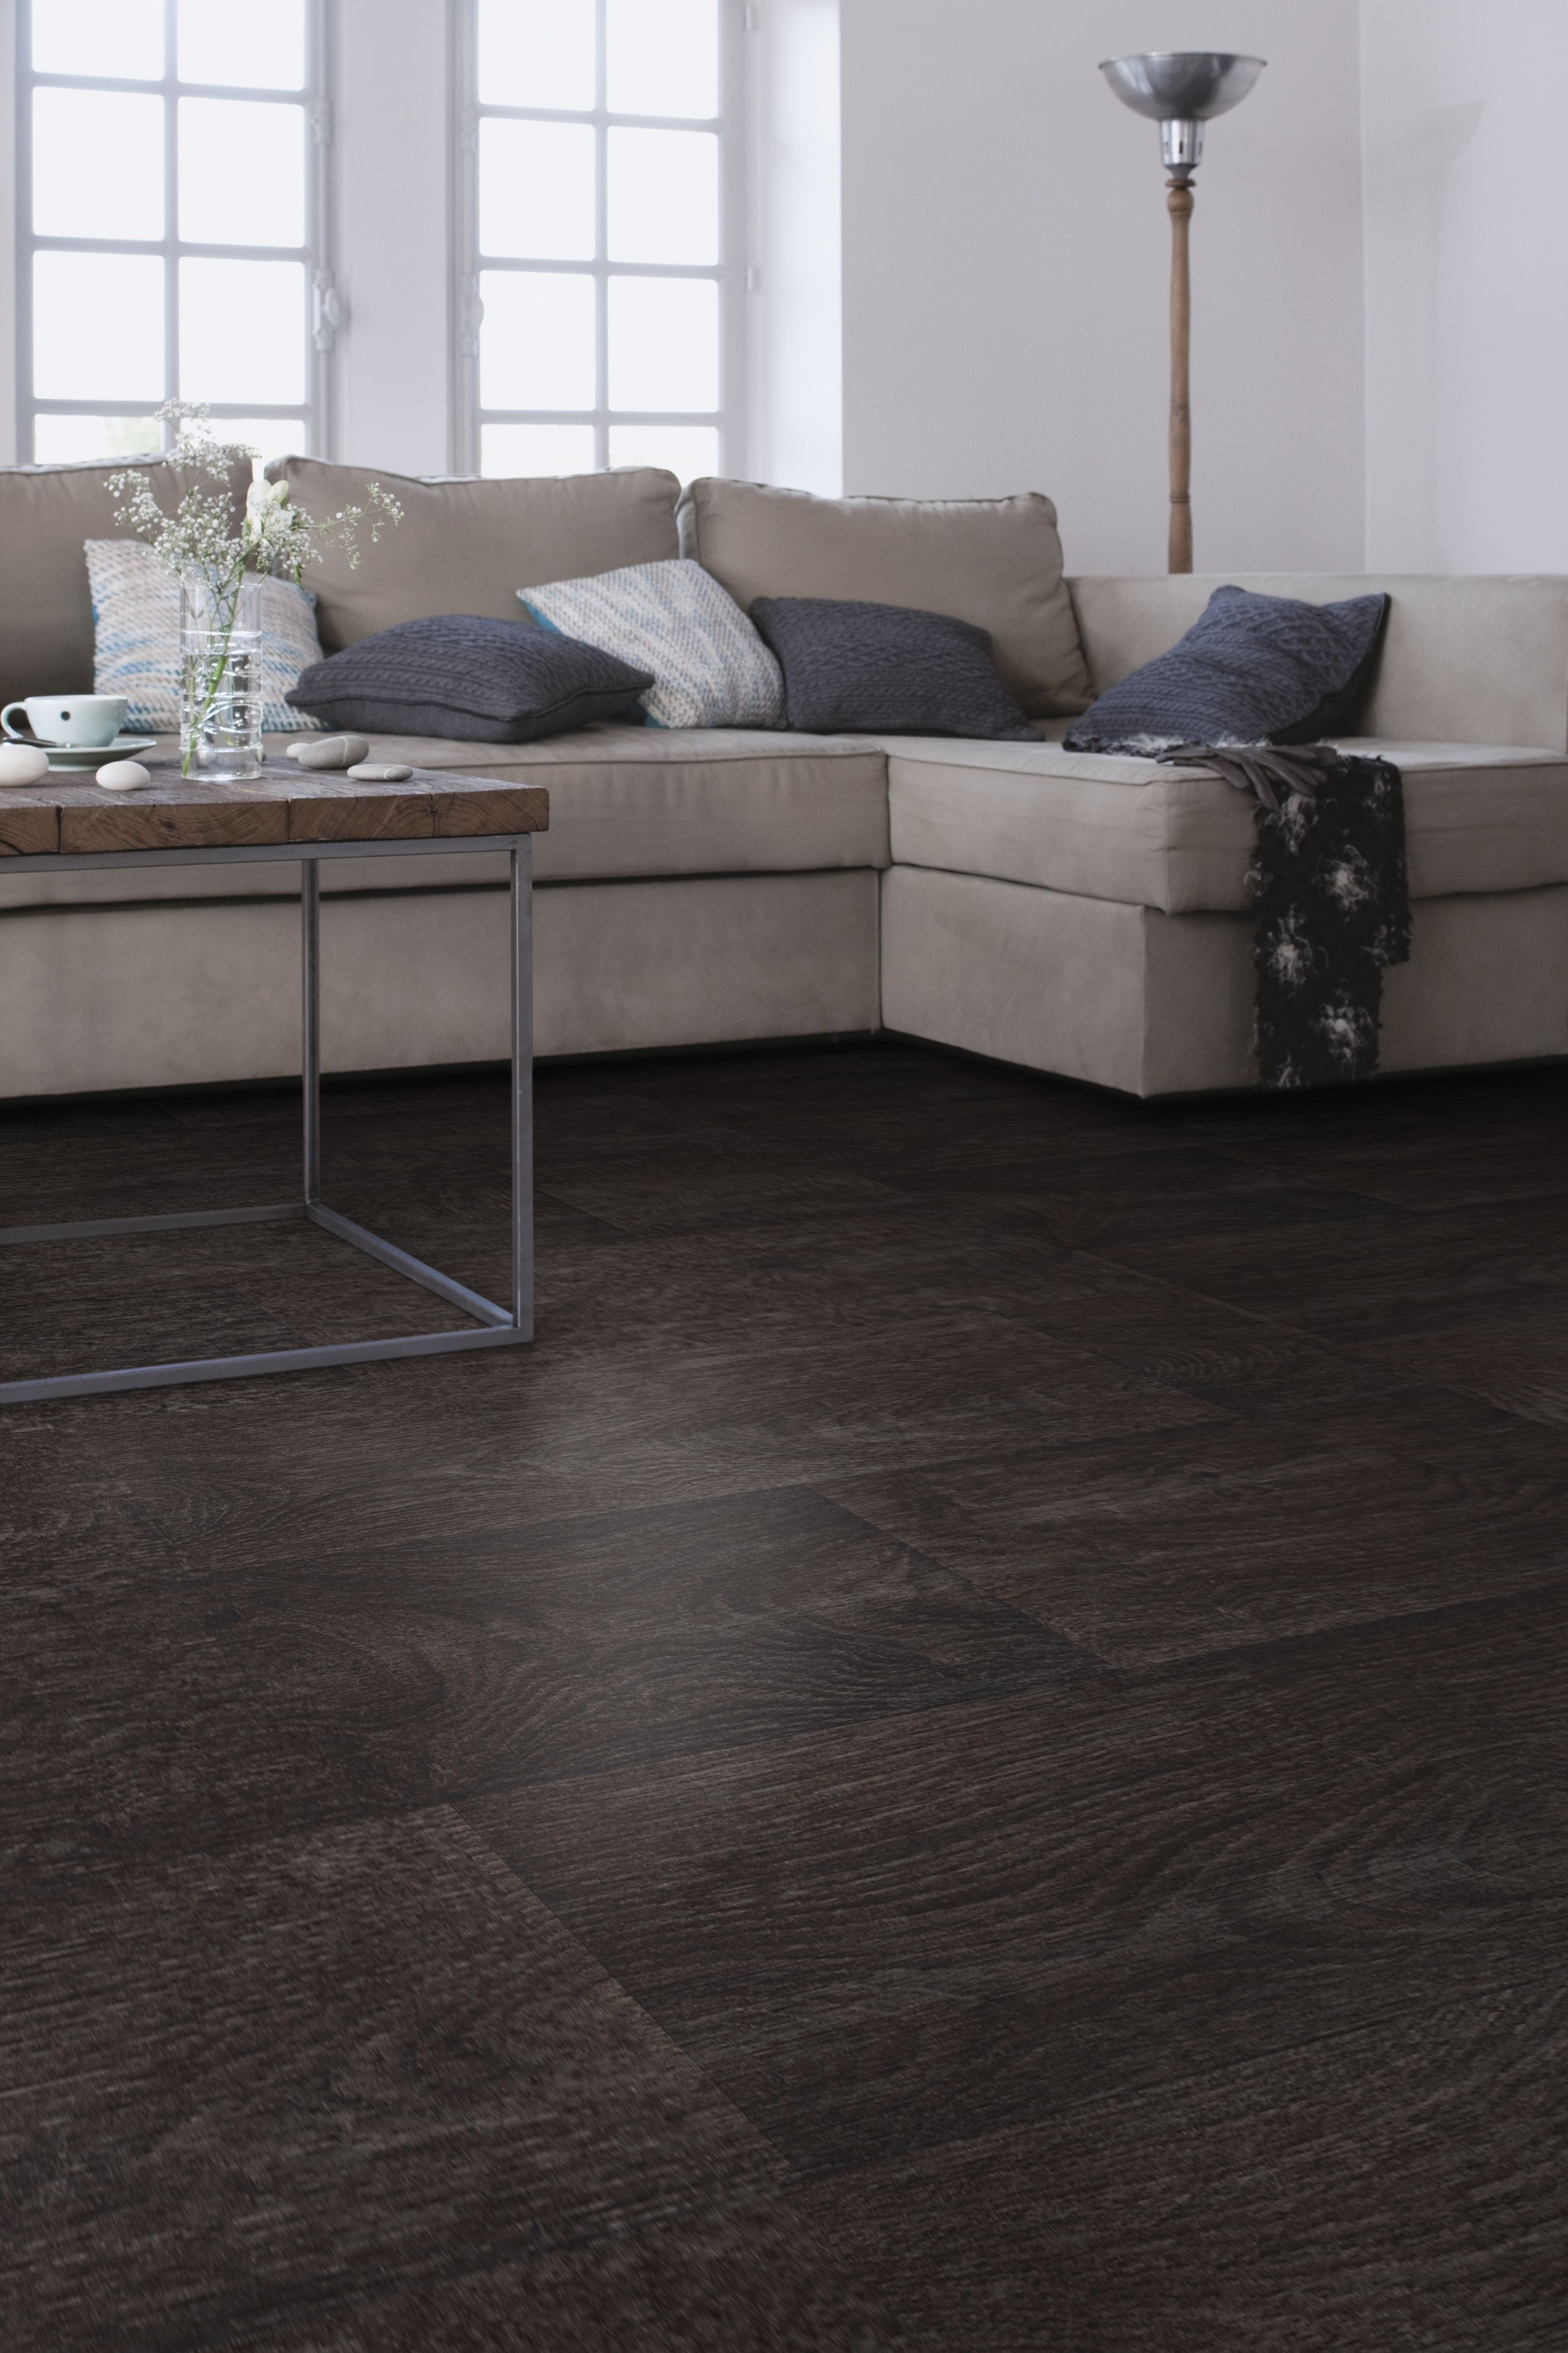 Newport Ebene Primetex By Gerflor Flooring Design Trendy Living Rooms Interior Design Living Room Living Room Tiles #vinyl #flooring #living #room #ideas